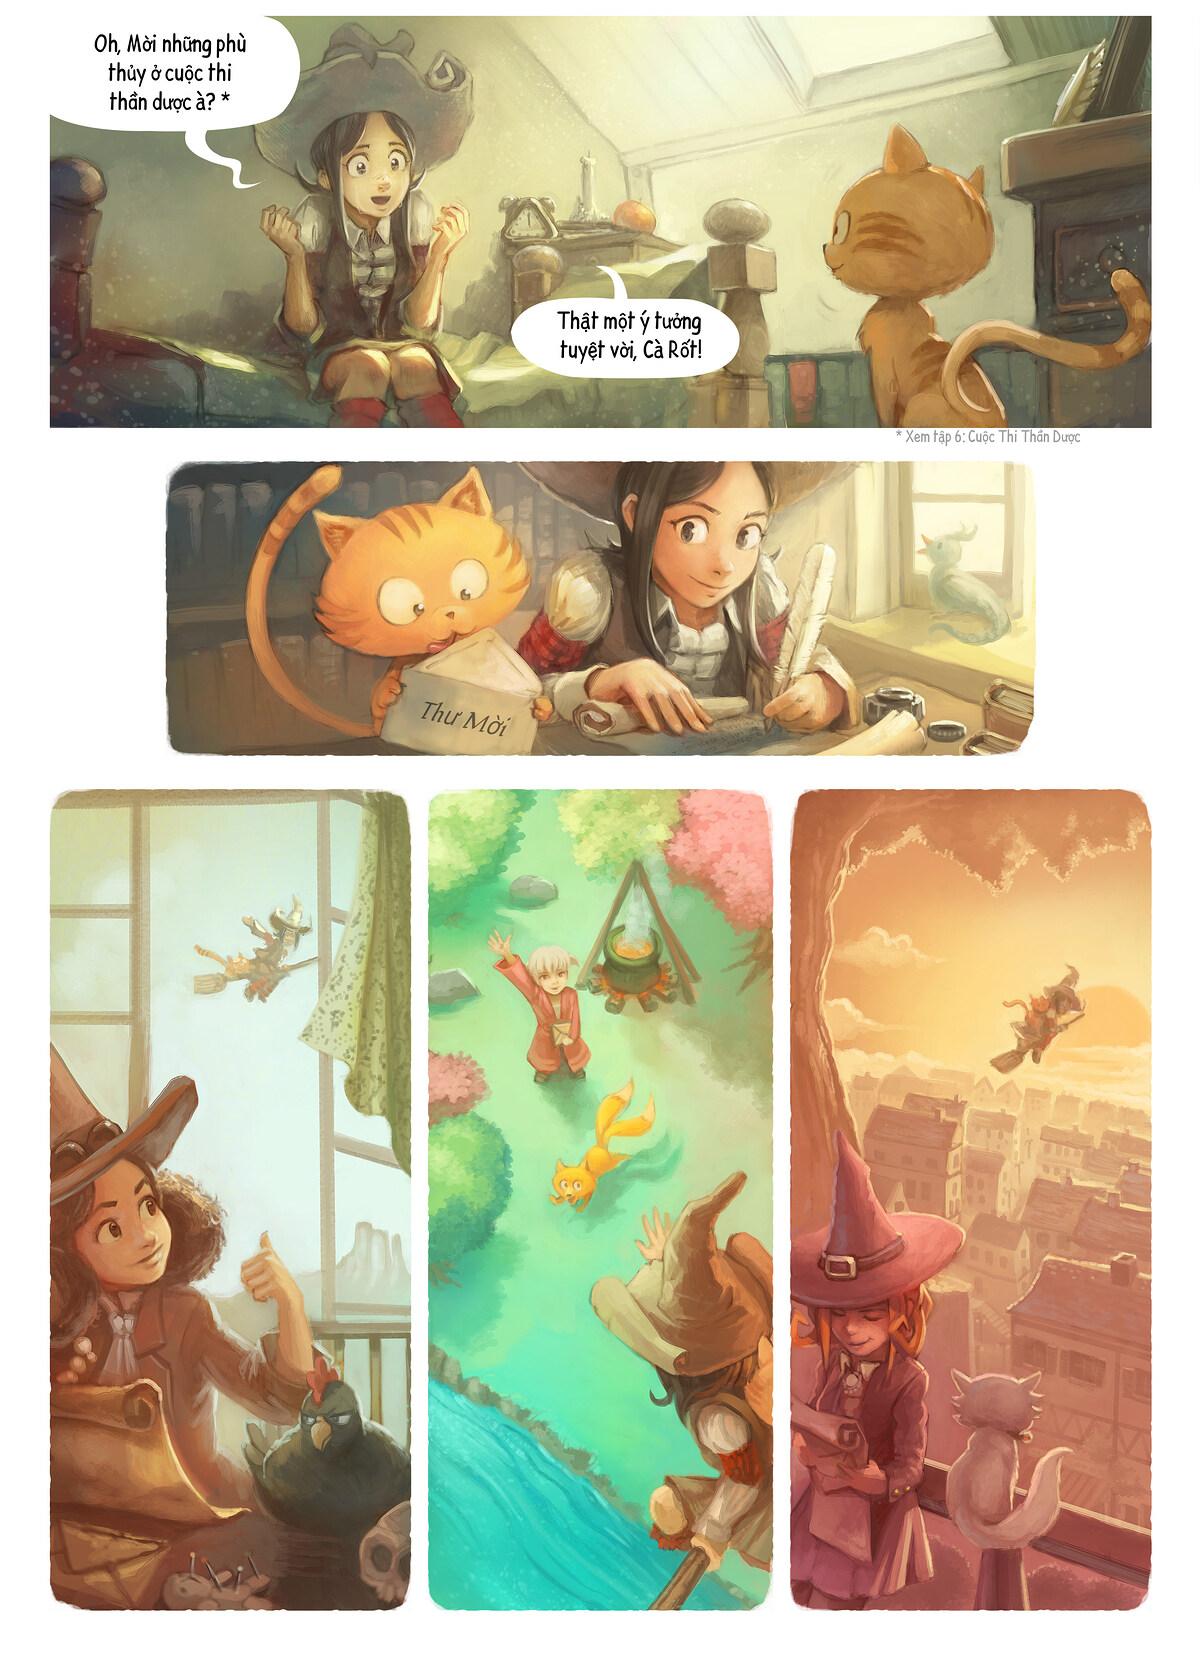 A webcomic page of Pepper&Carrot, Tập 8 [vi], trang 2